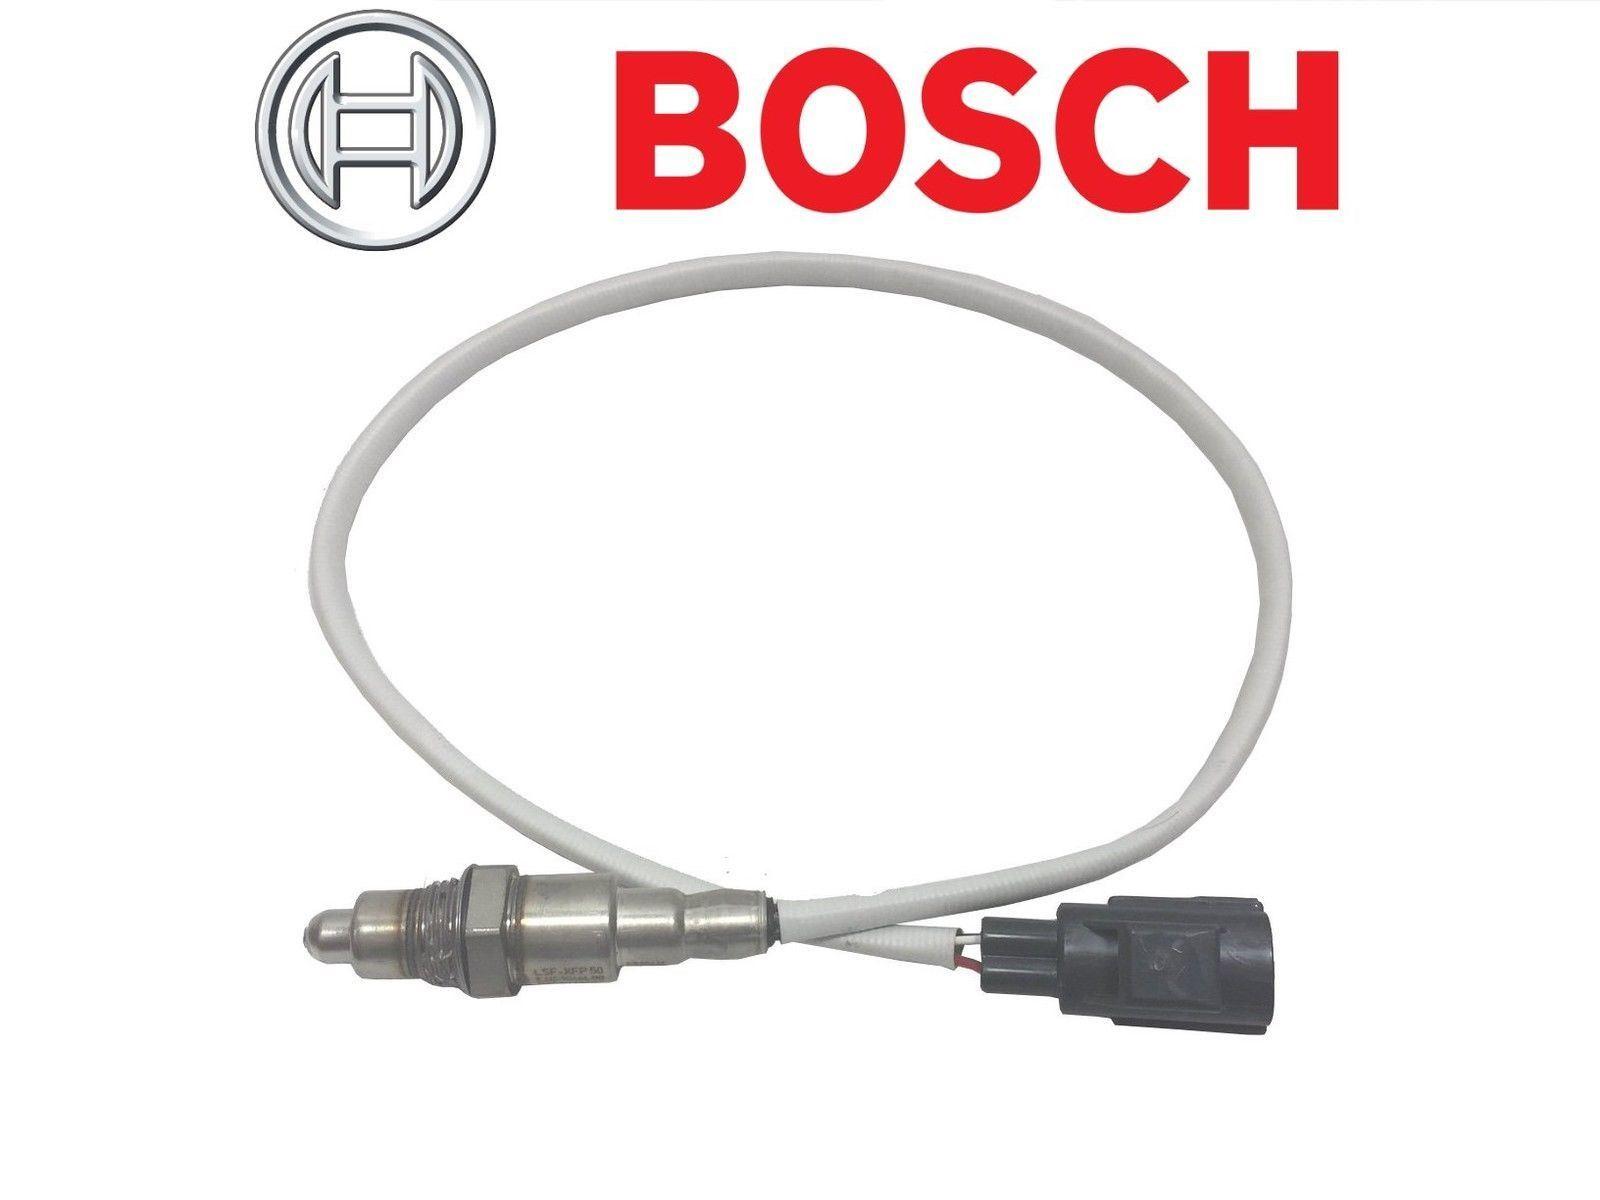 Bosch O2 Sensor Wiring Colors